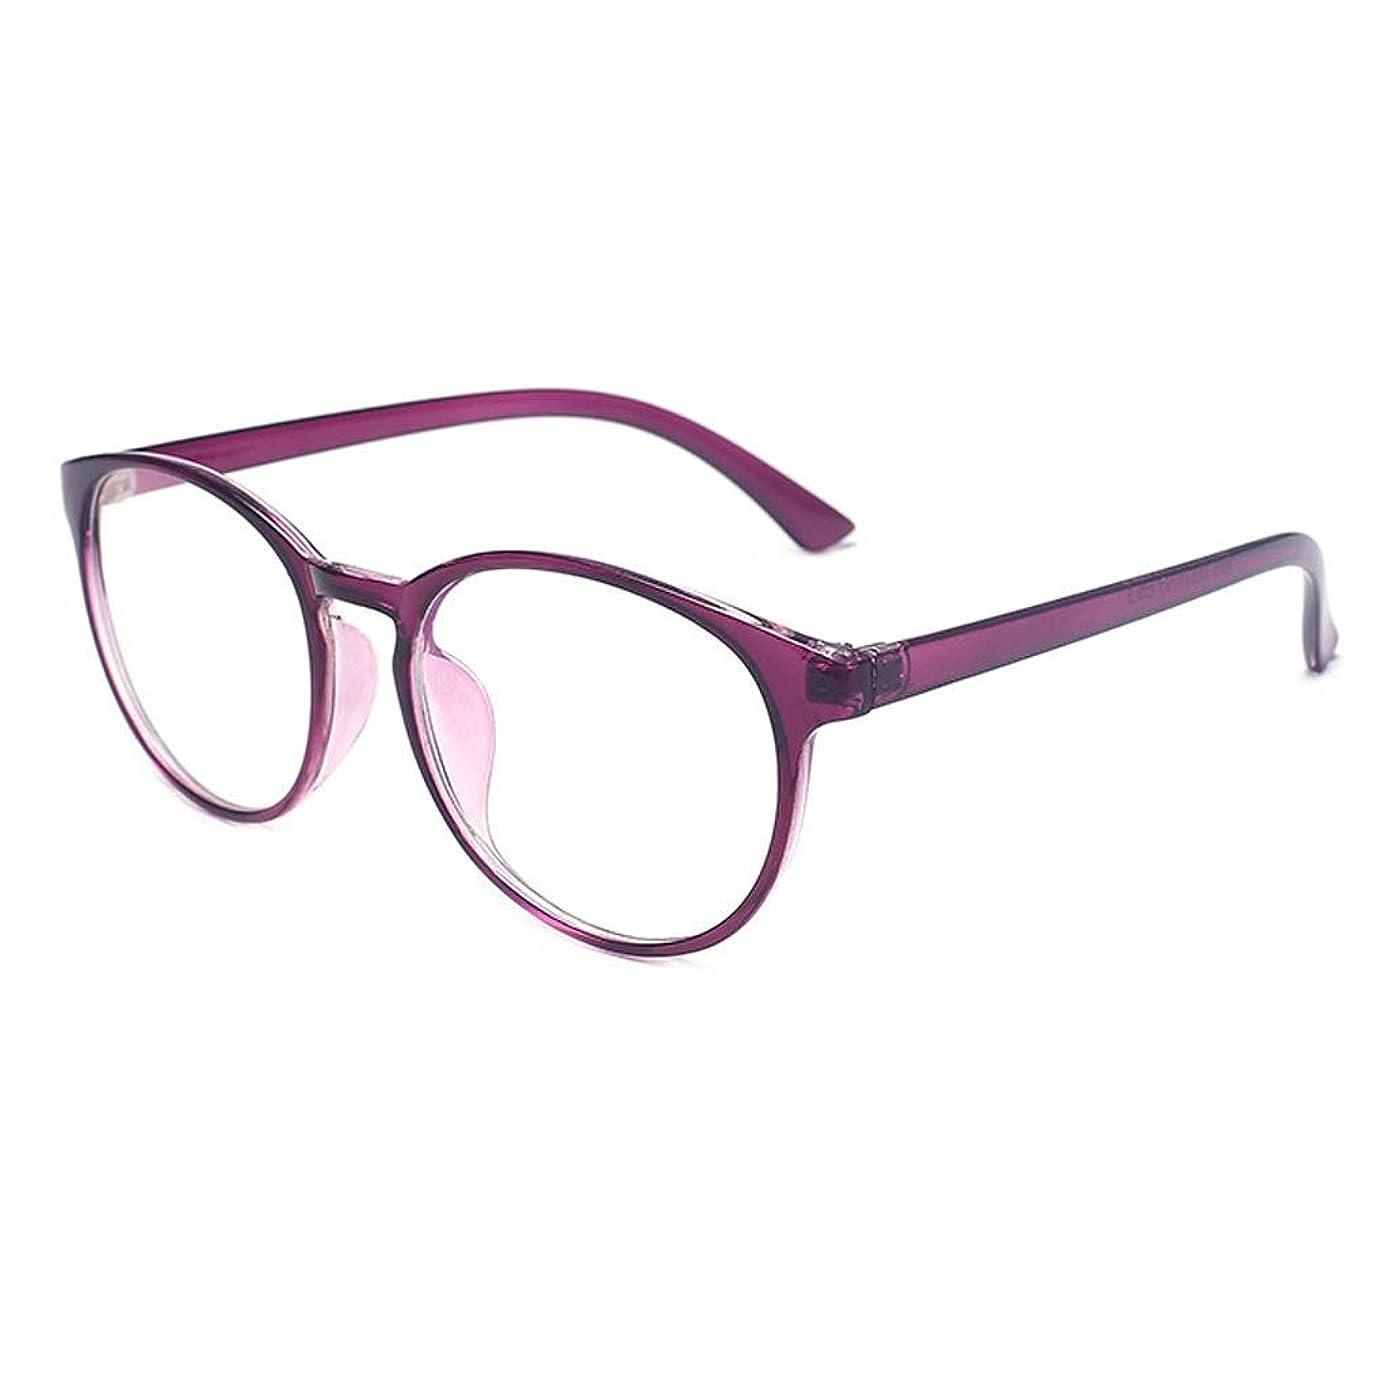 BMY Modern Simplicity Blue Light Blocking Glasses Safety Glasses for Computer/Phone Better Sleep [Anti Eye Fatigue] Unisex (Men/Women) (Color : Purple)